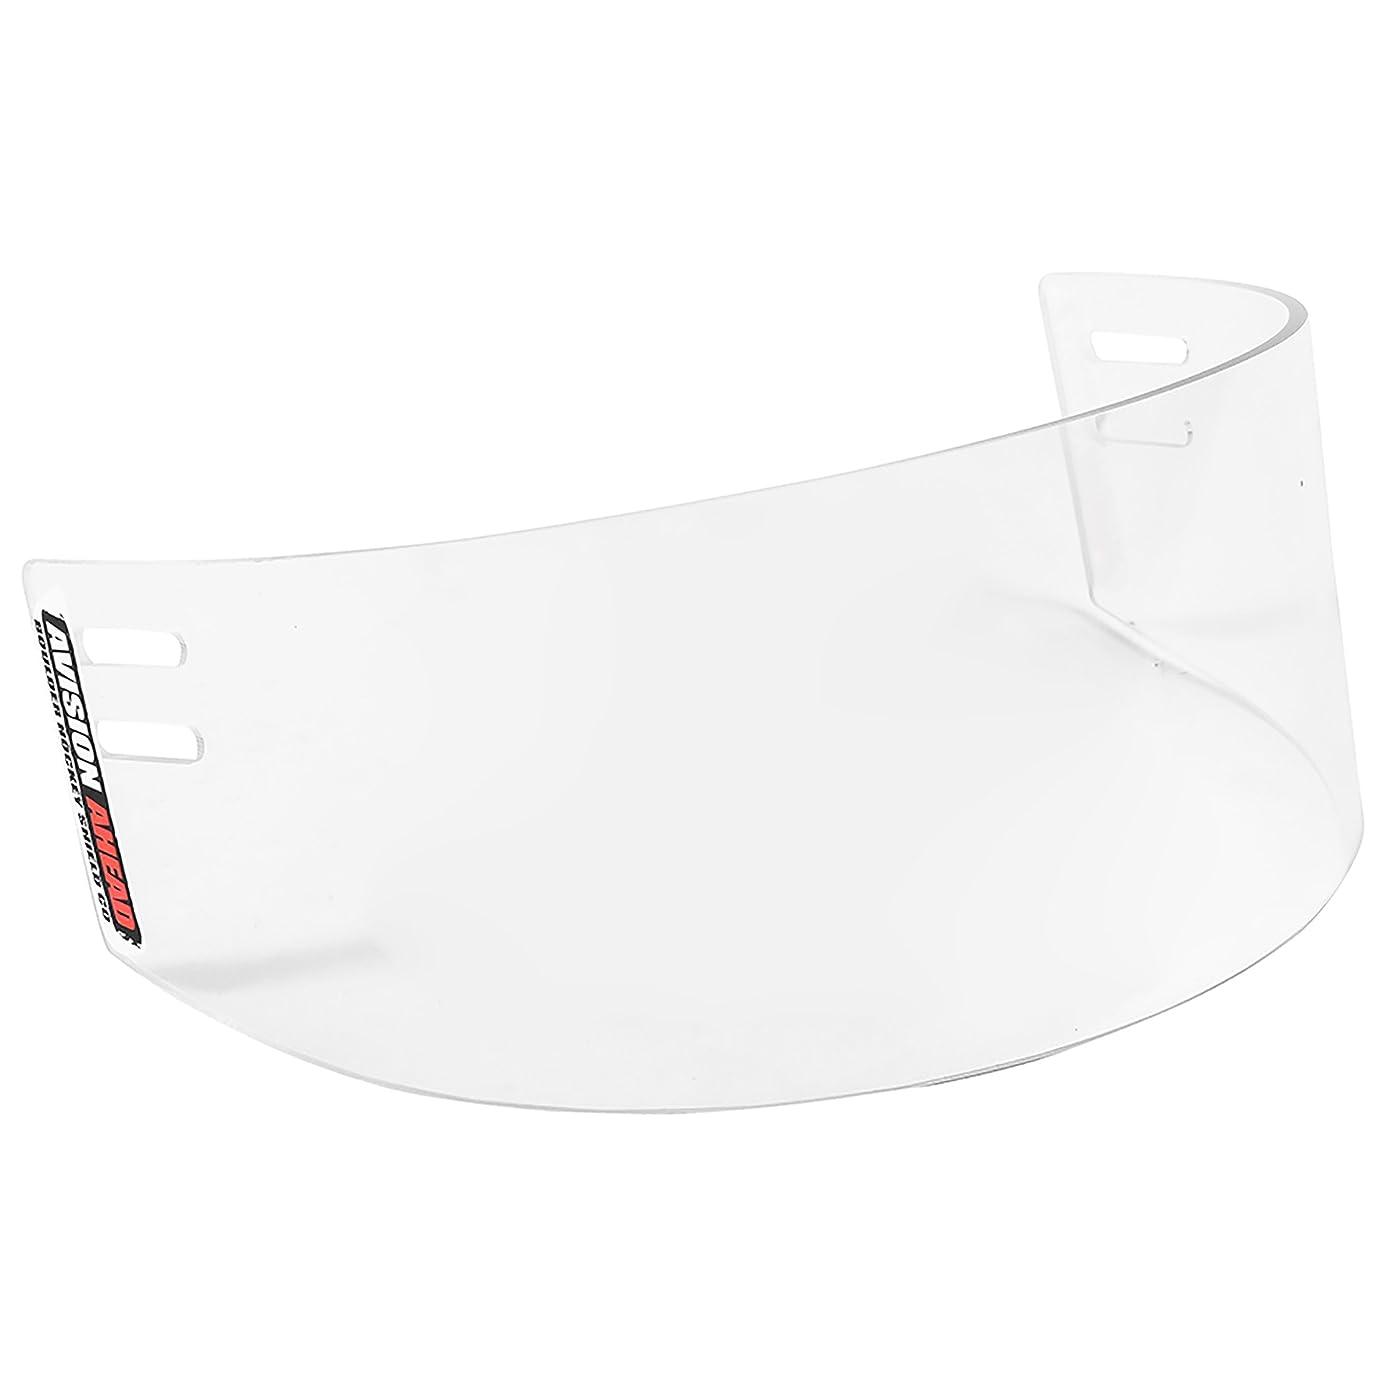 20/20 Anti-Fog and Scratch Resistant Polycarbonate Hockey Shield Visor